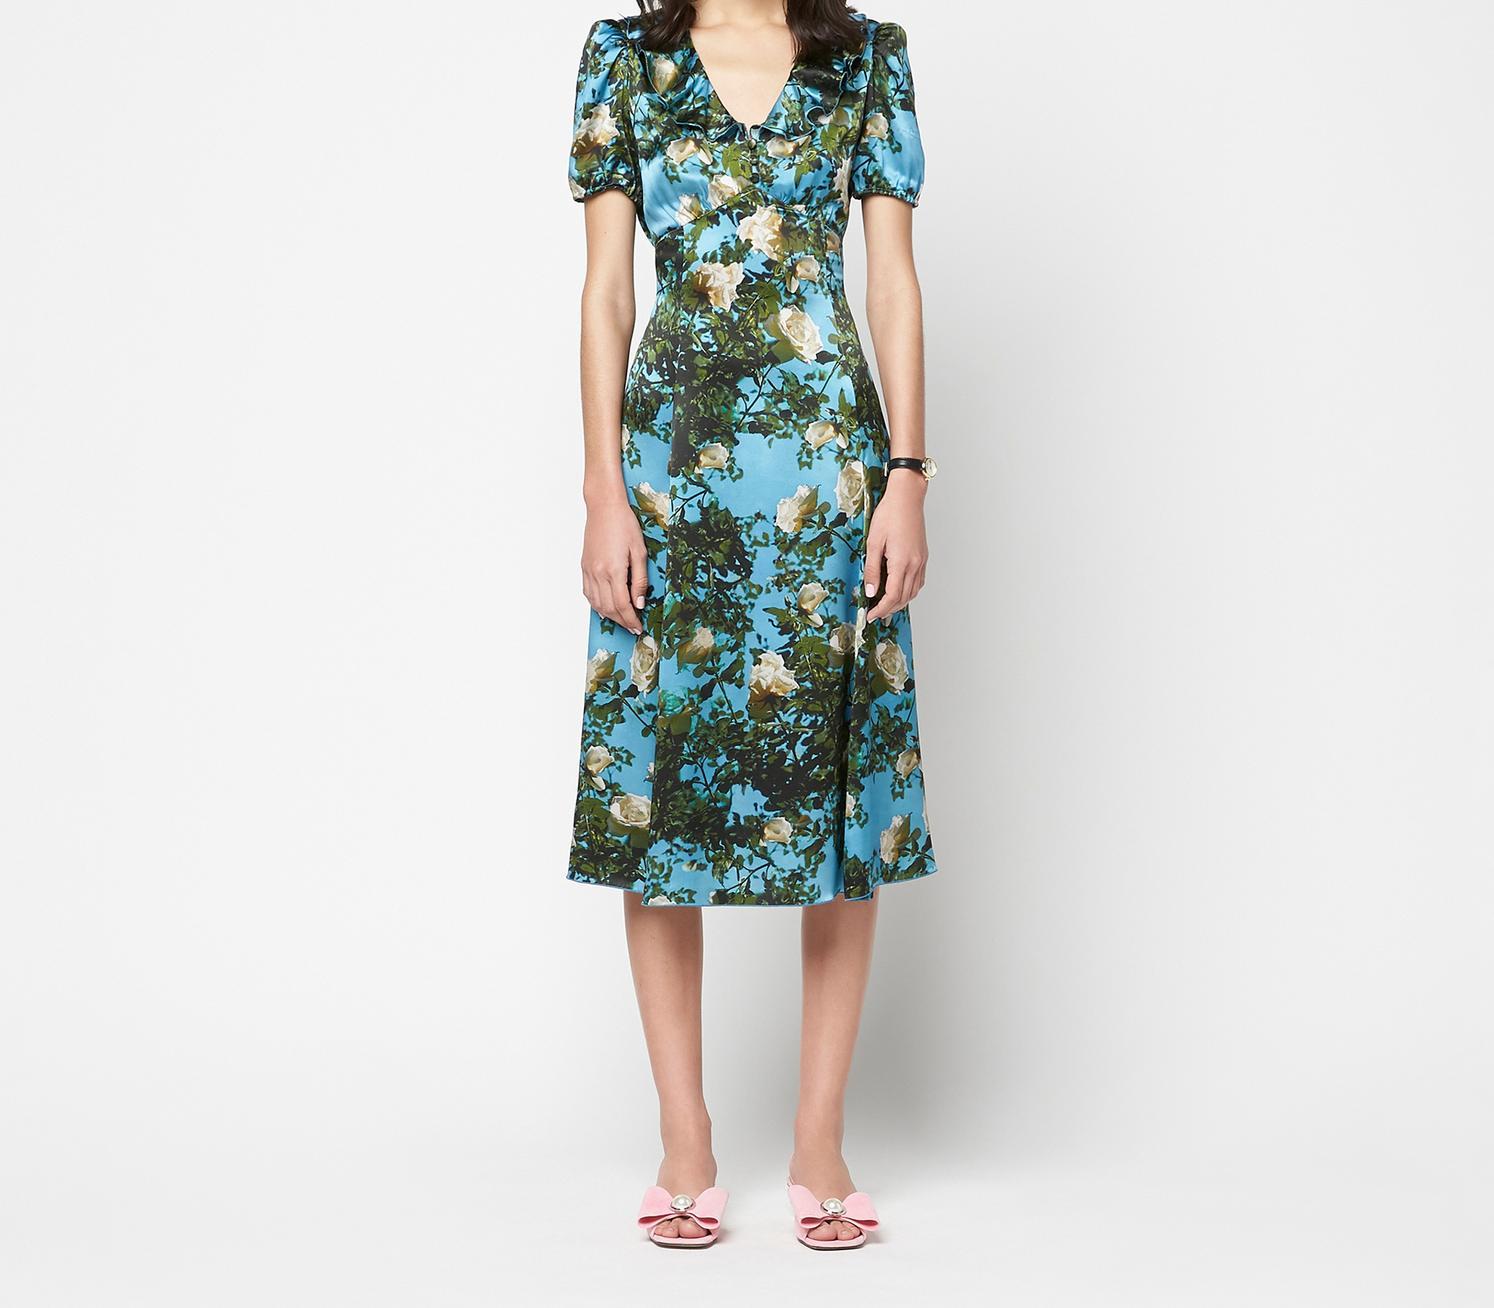 MARC JACOBS Love Dress